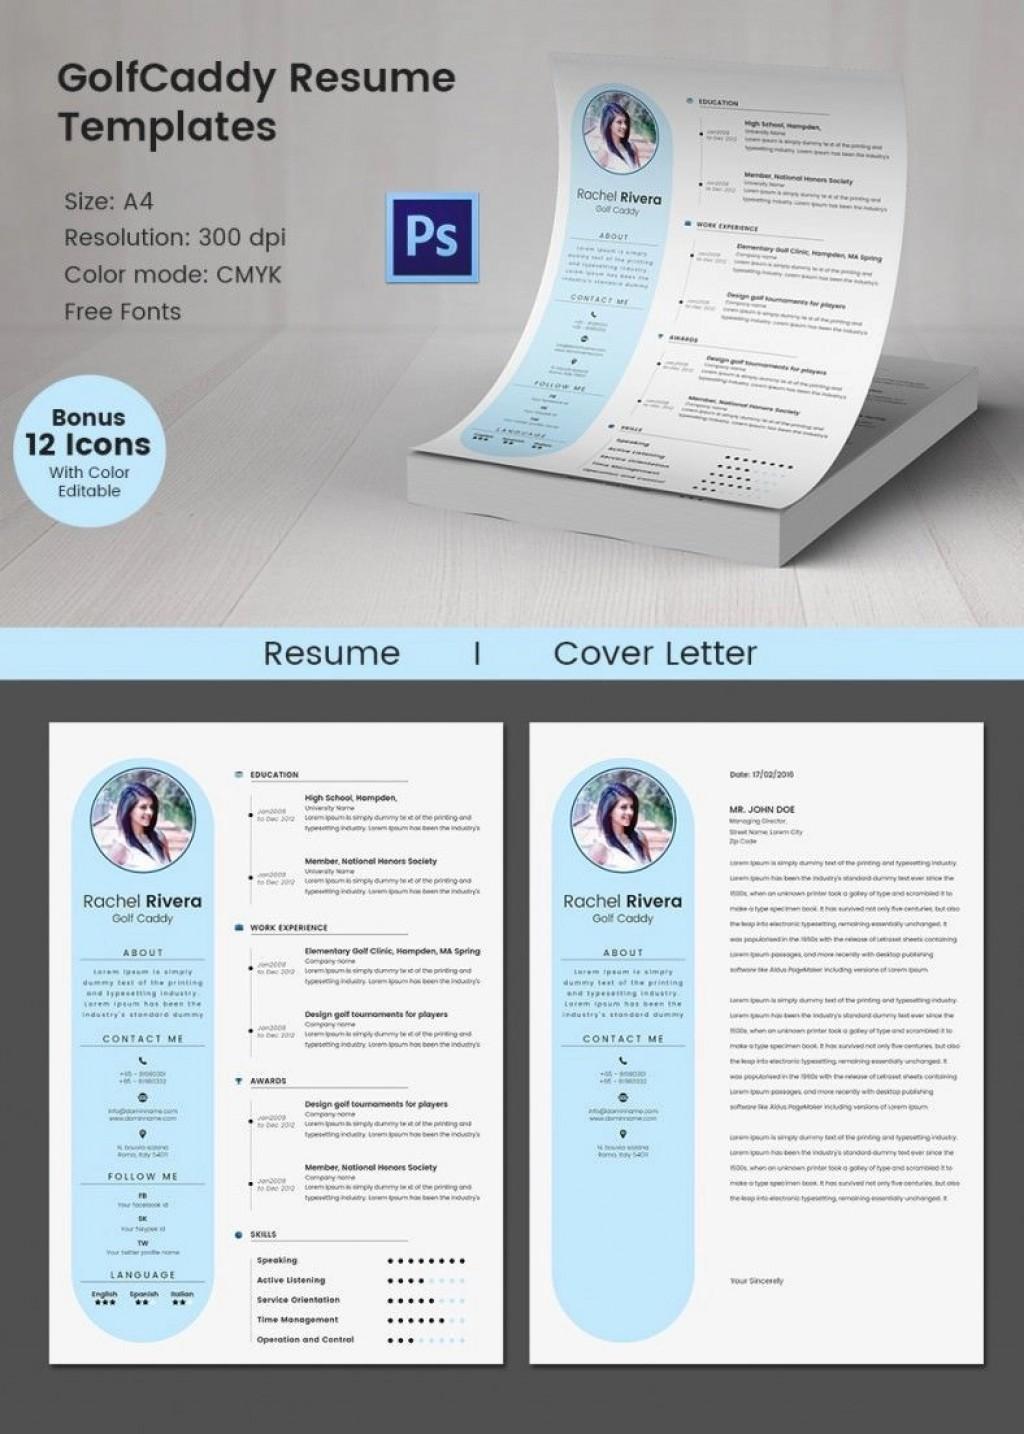 009 Excellent Software Engineering Resume Template High Def  Engineer Microsoft Word Cv Free Developer DownloadLarge